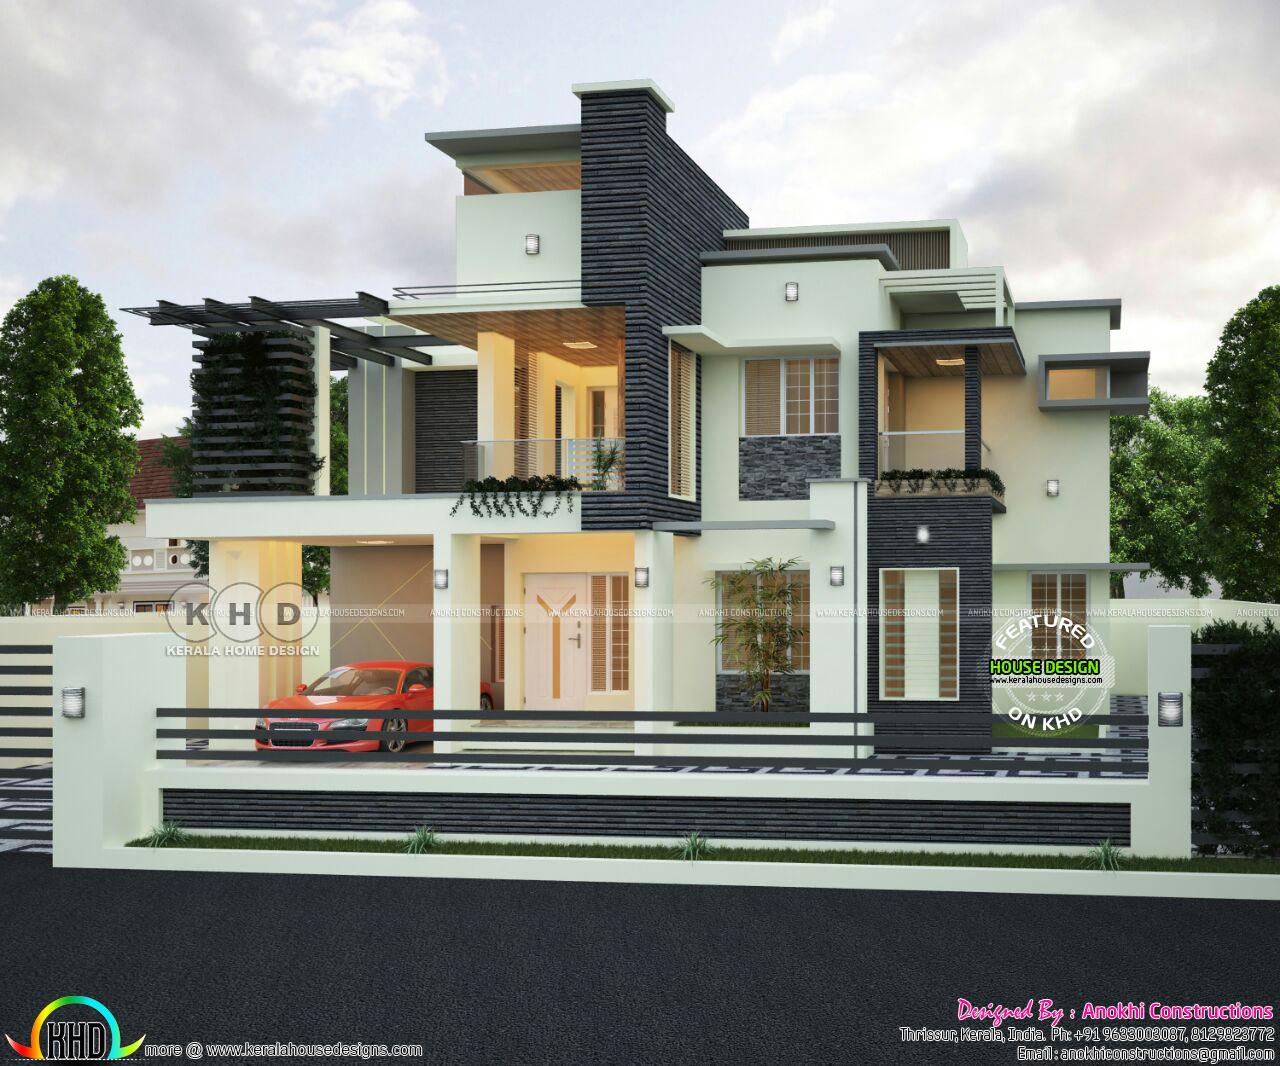 2320 Square Feet 3 Bedroom Decorative House Kerala Home